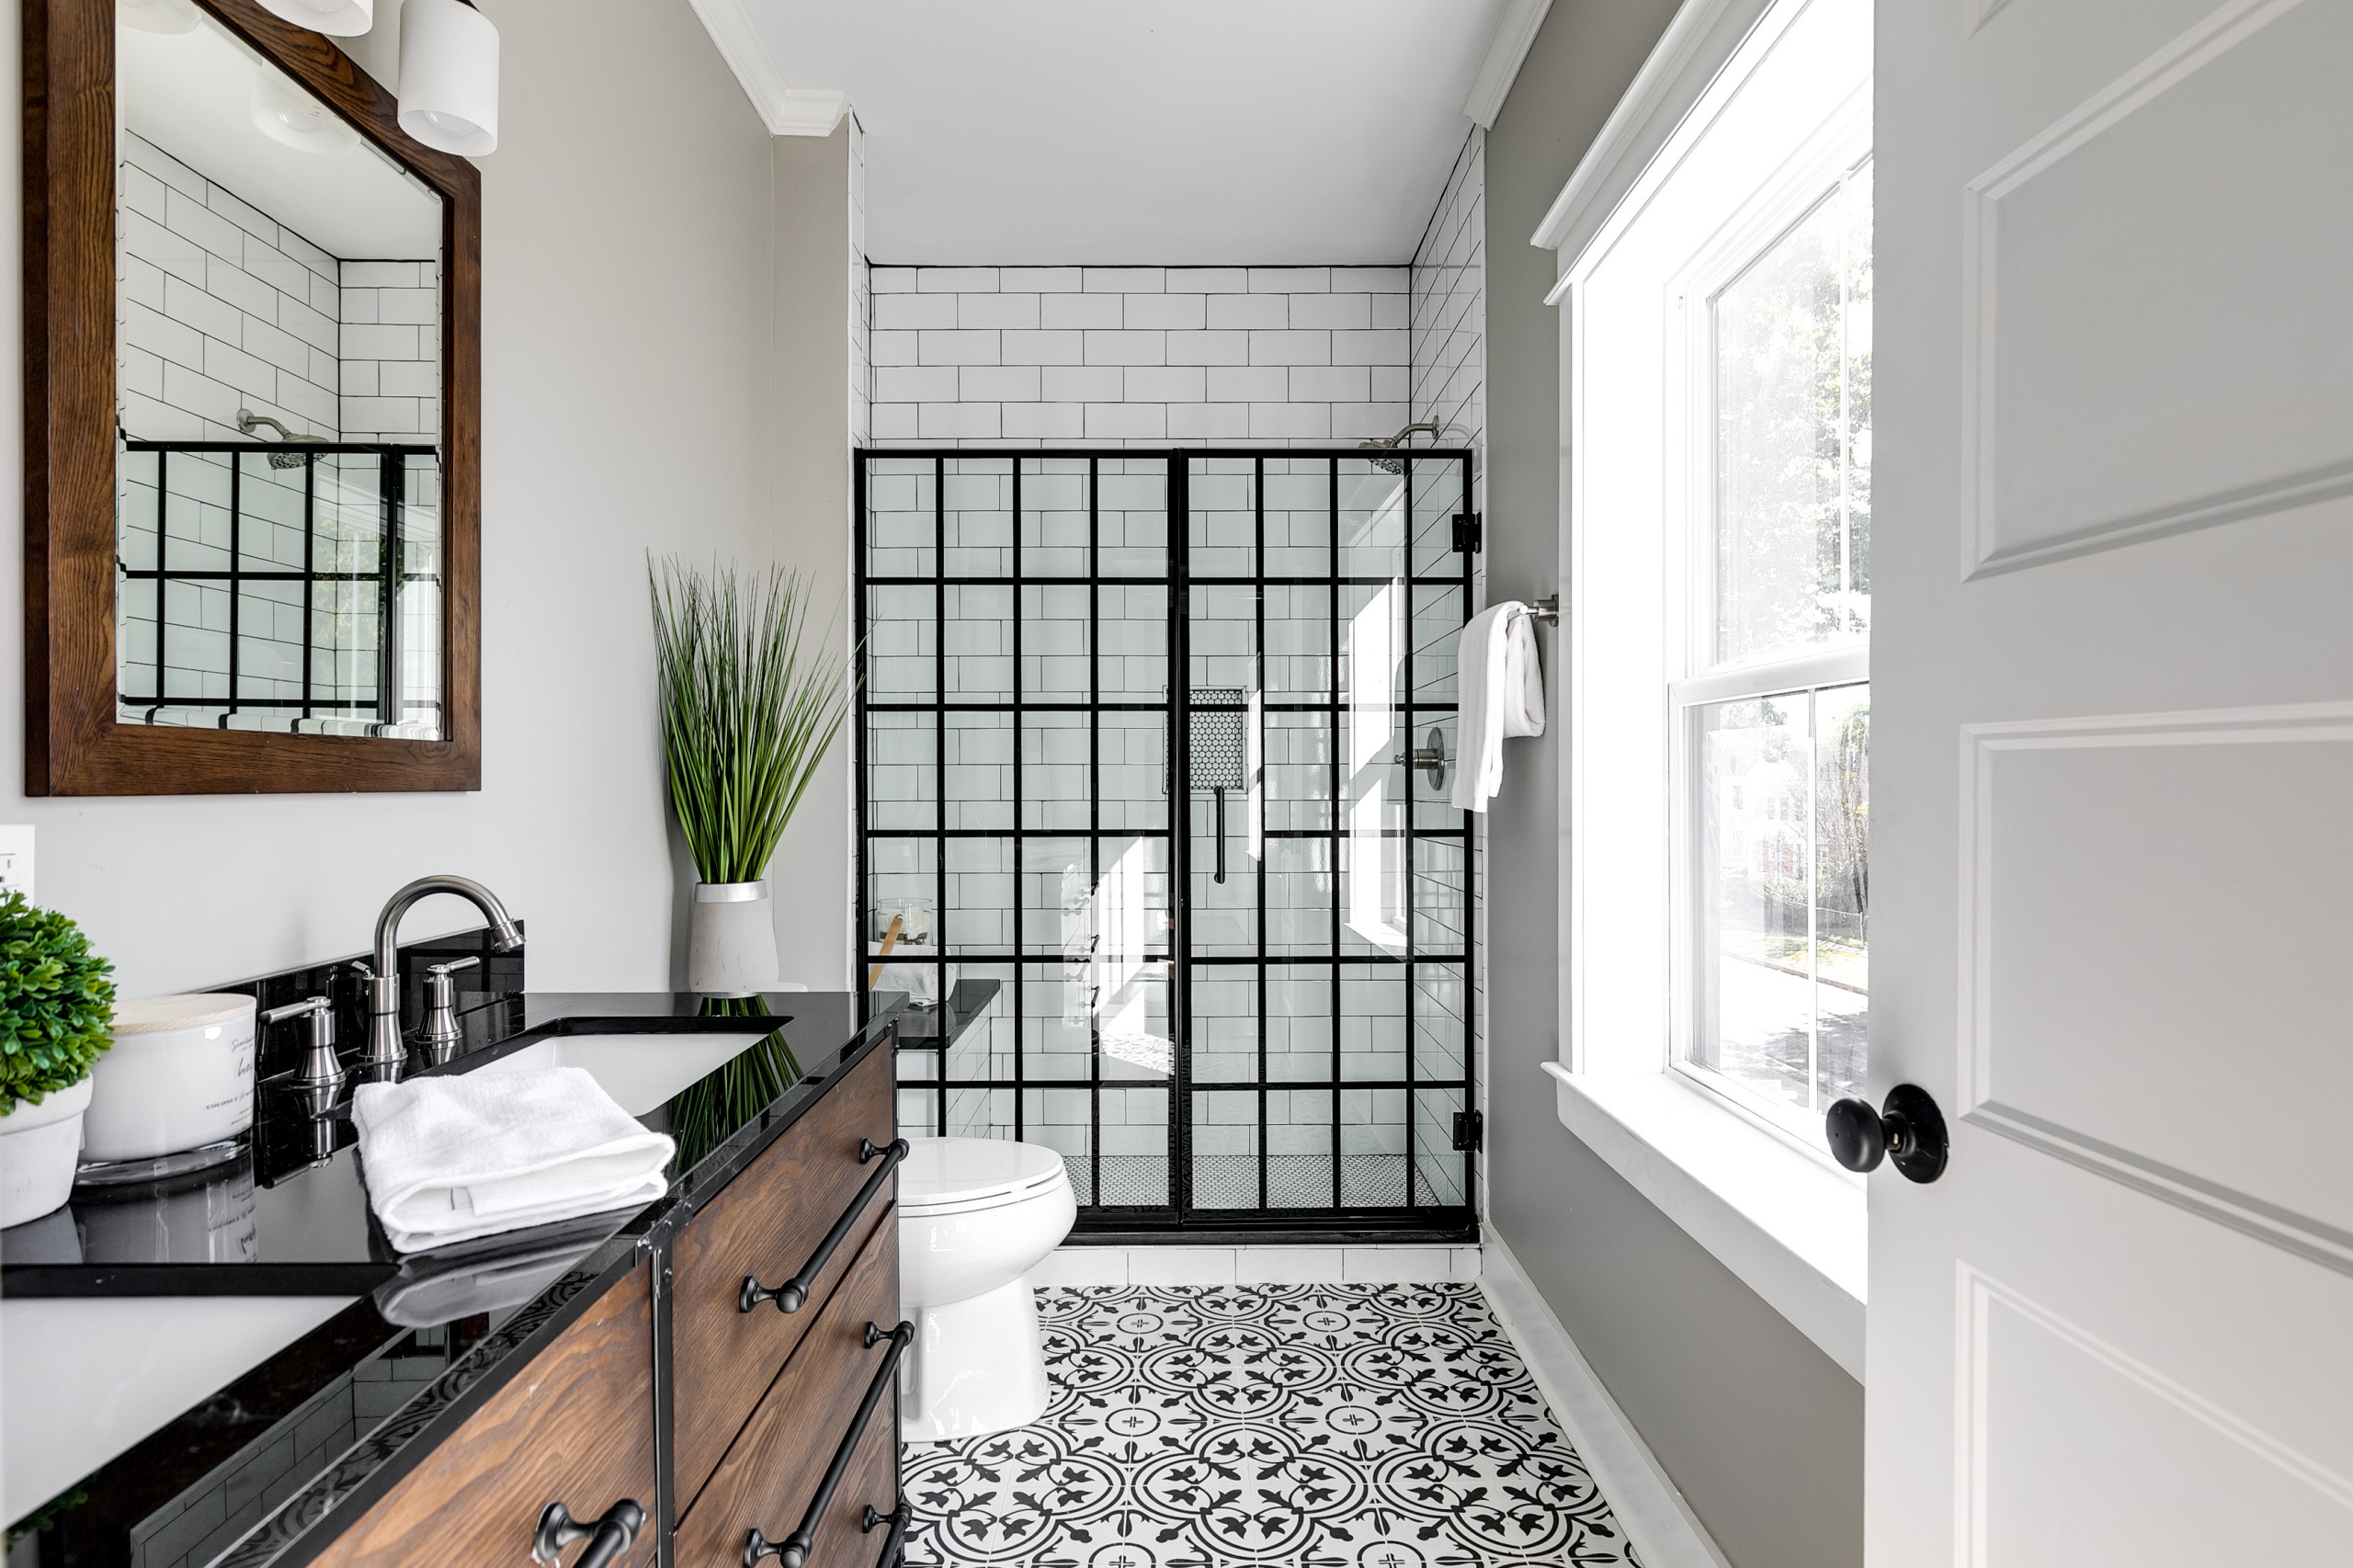 75 Beautiful Black Bathroom Pictures Ideas October 2020 Houzz